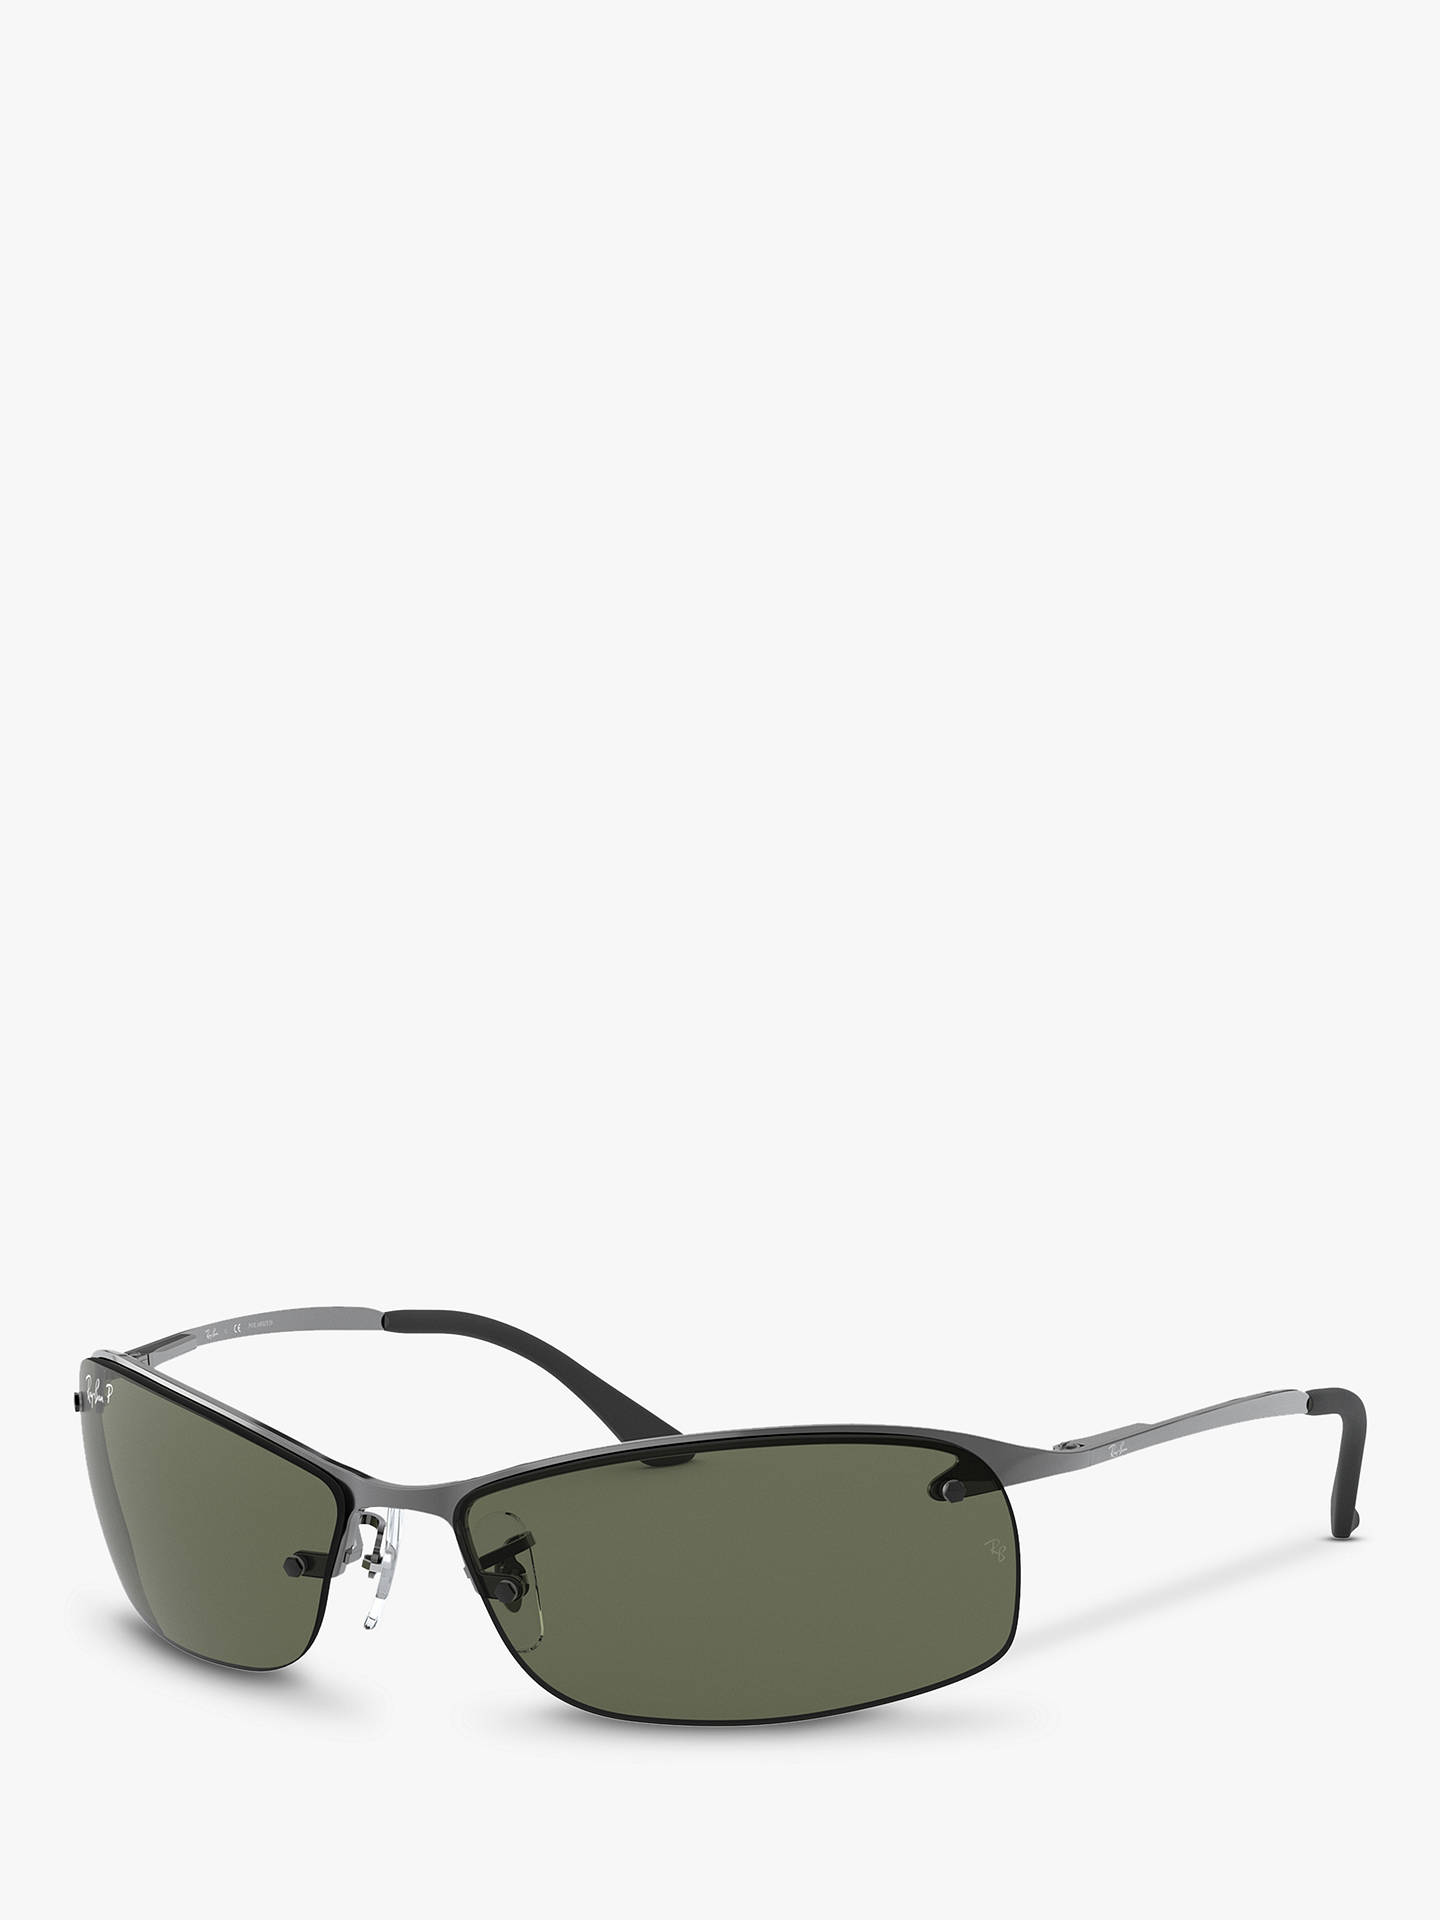 6d4d0234d2 Ray-Ban RB3183 Polarised Rectangular Sunglasses at John Lewis   Partners